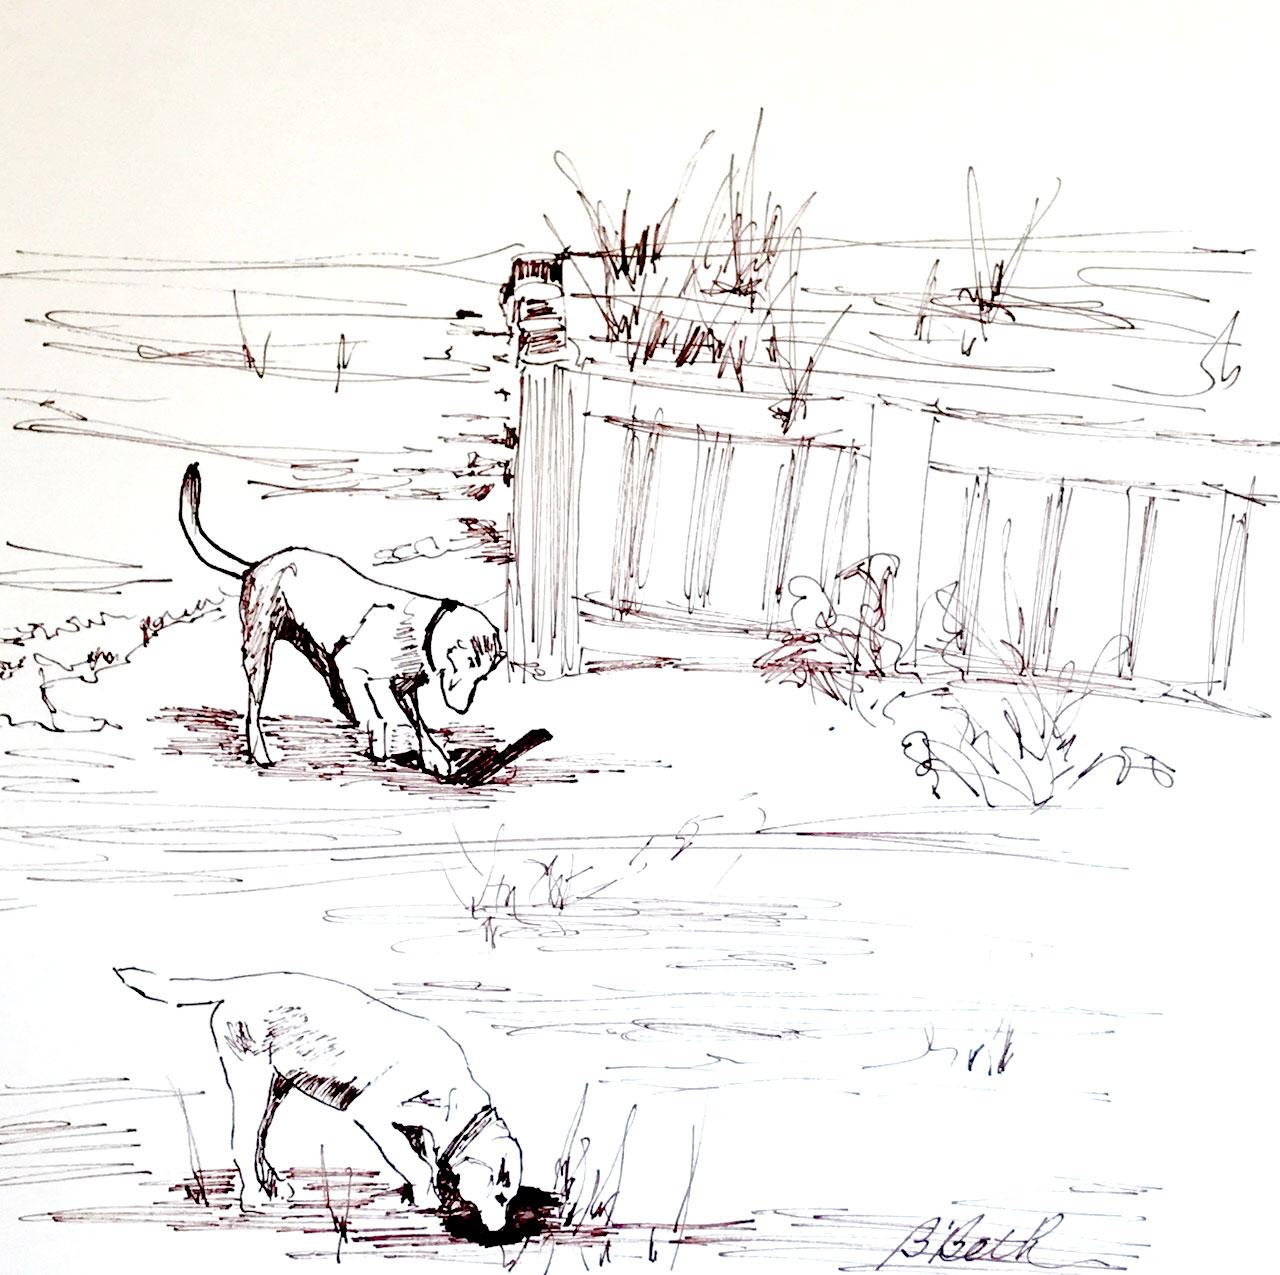 "TREASURE HUNTING, 12"" x 12"", Pen & Ink"